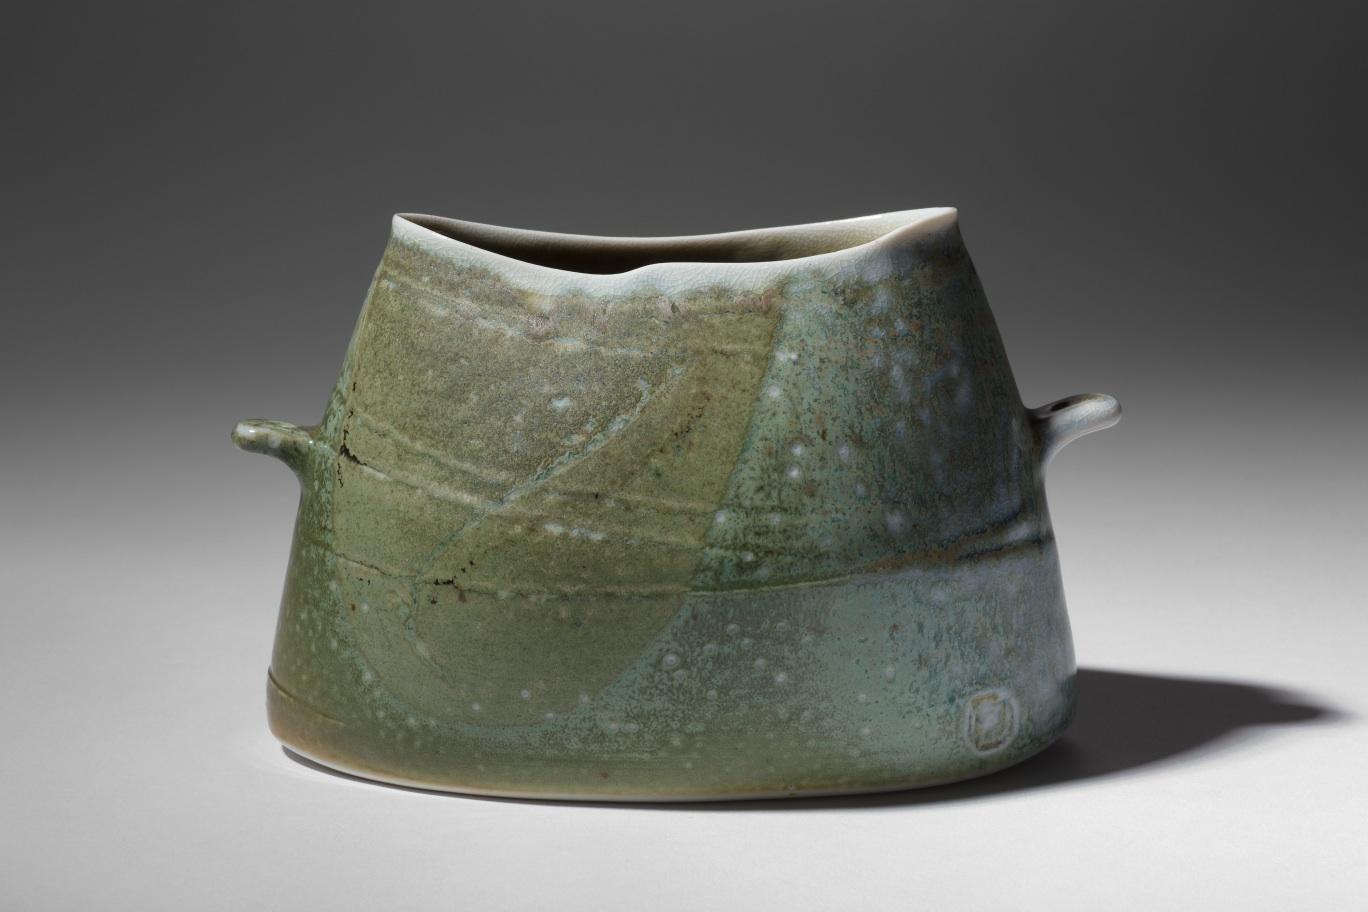 Mandy Parslow, MP11 Handled Elliptical Vessel, wood fired salt glazed stoneware, 11 x 18 x 9cm, EUR 170